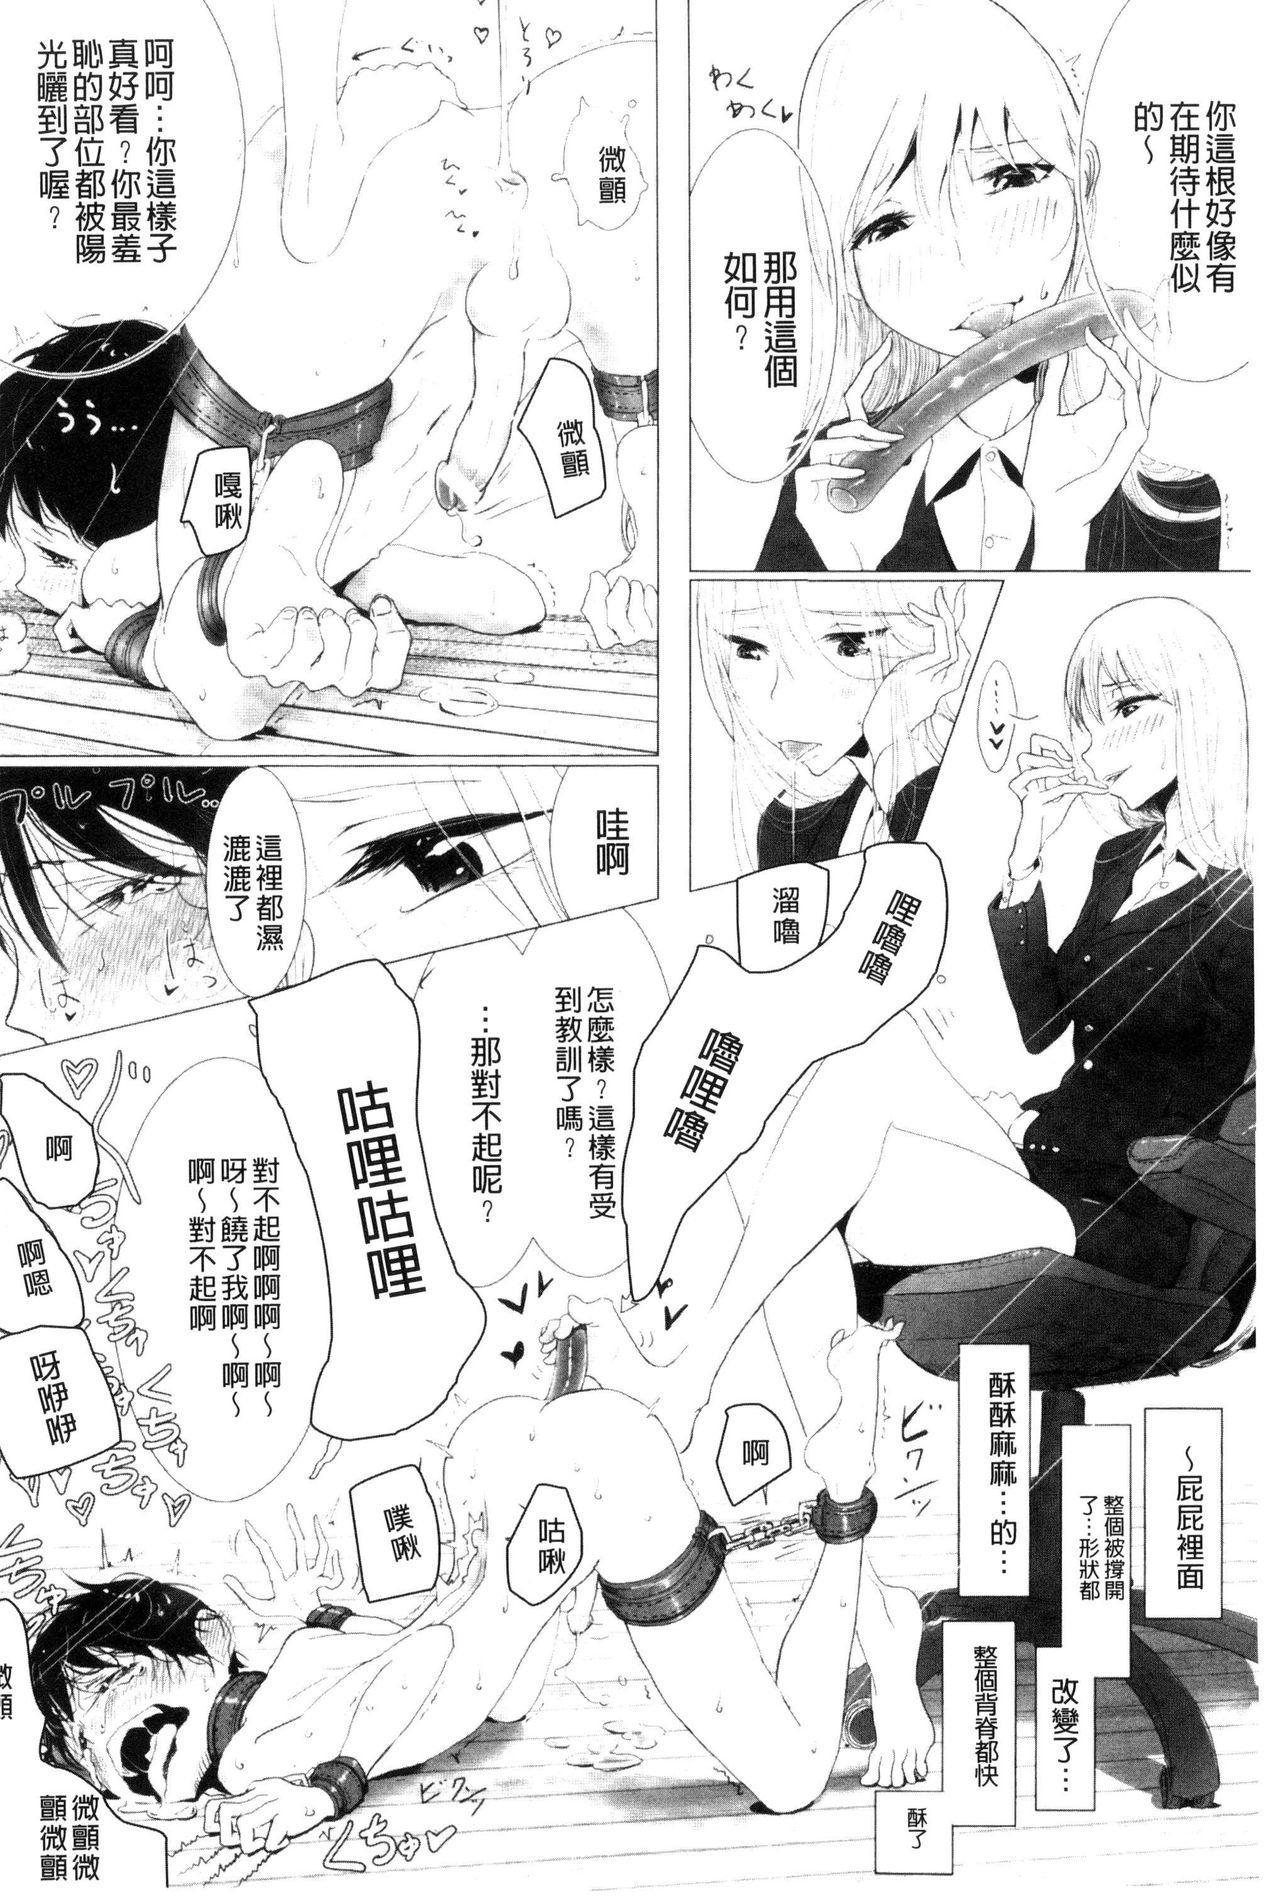 [Dhibi] Sono Yubisaki de Korogashite - Please Caress it at the Finger-tip. [Chinese] 171